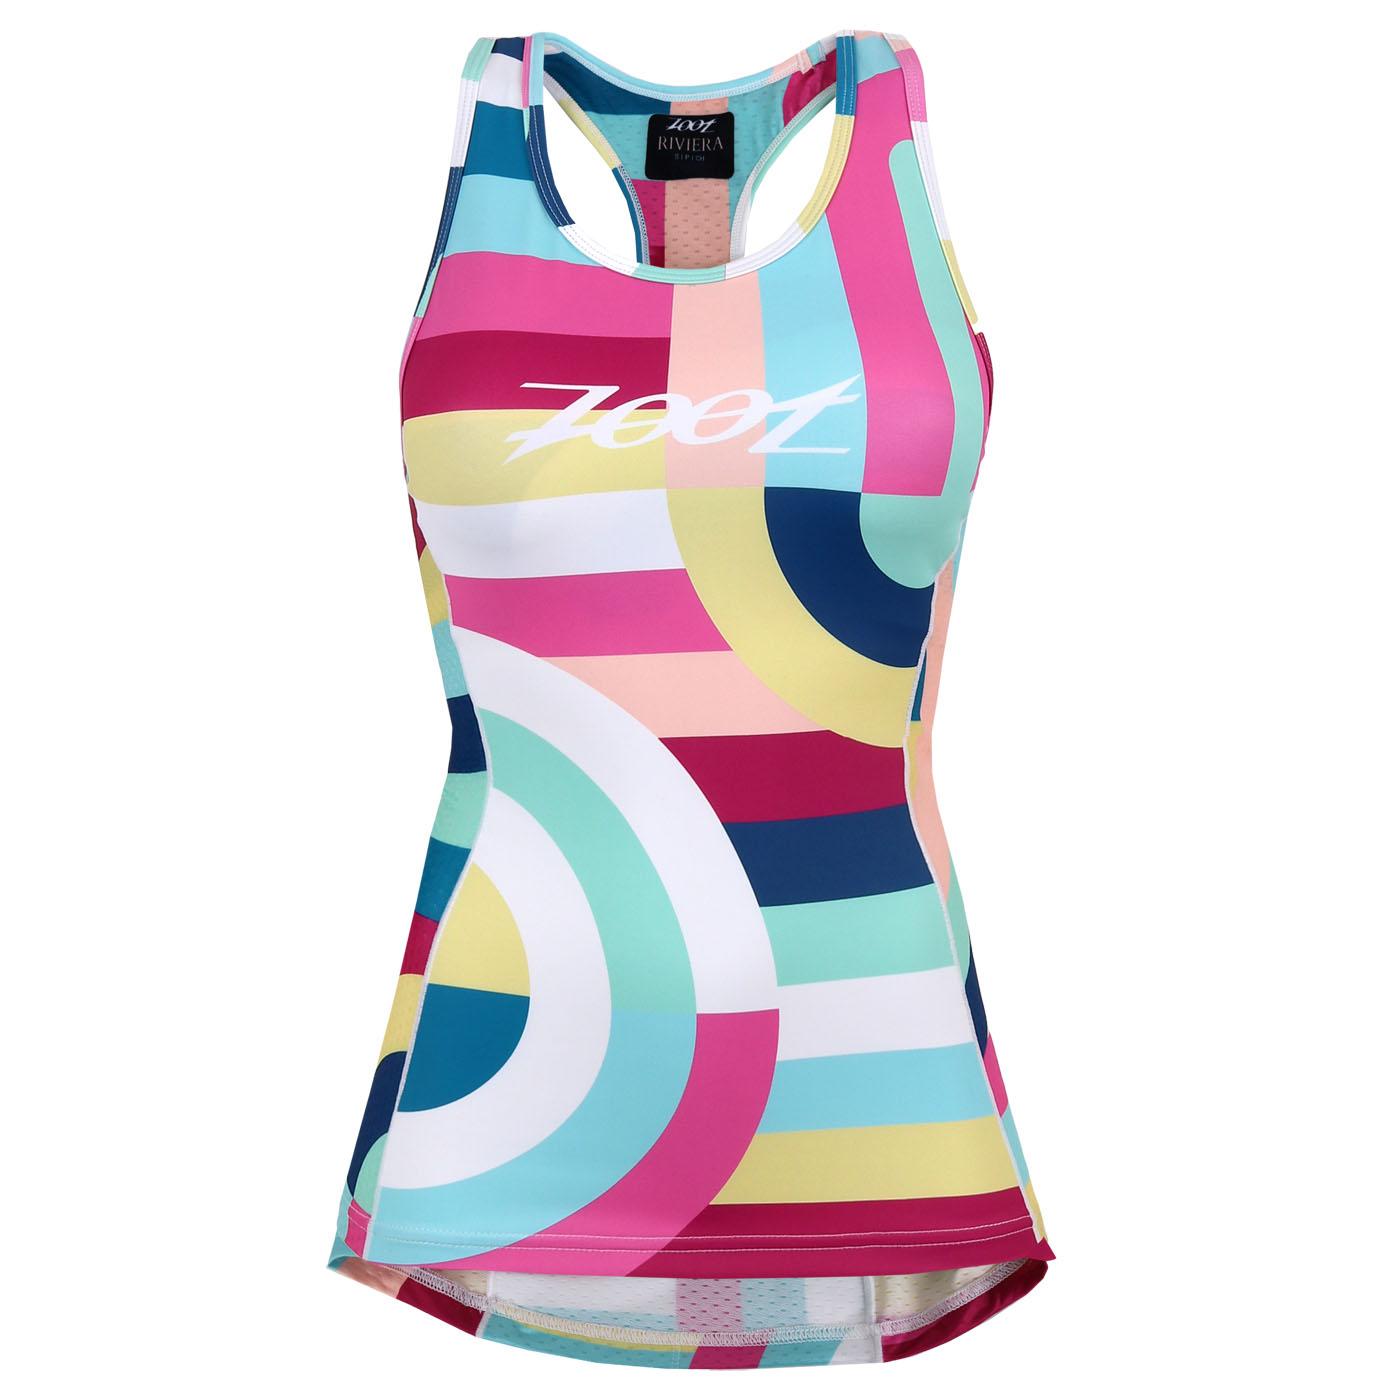 ZOOT LTD Tri Racerback Camiseta para mujers - riviera